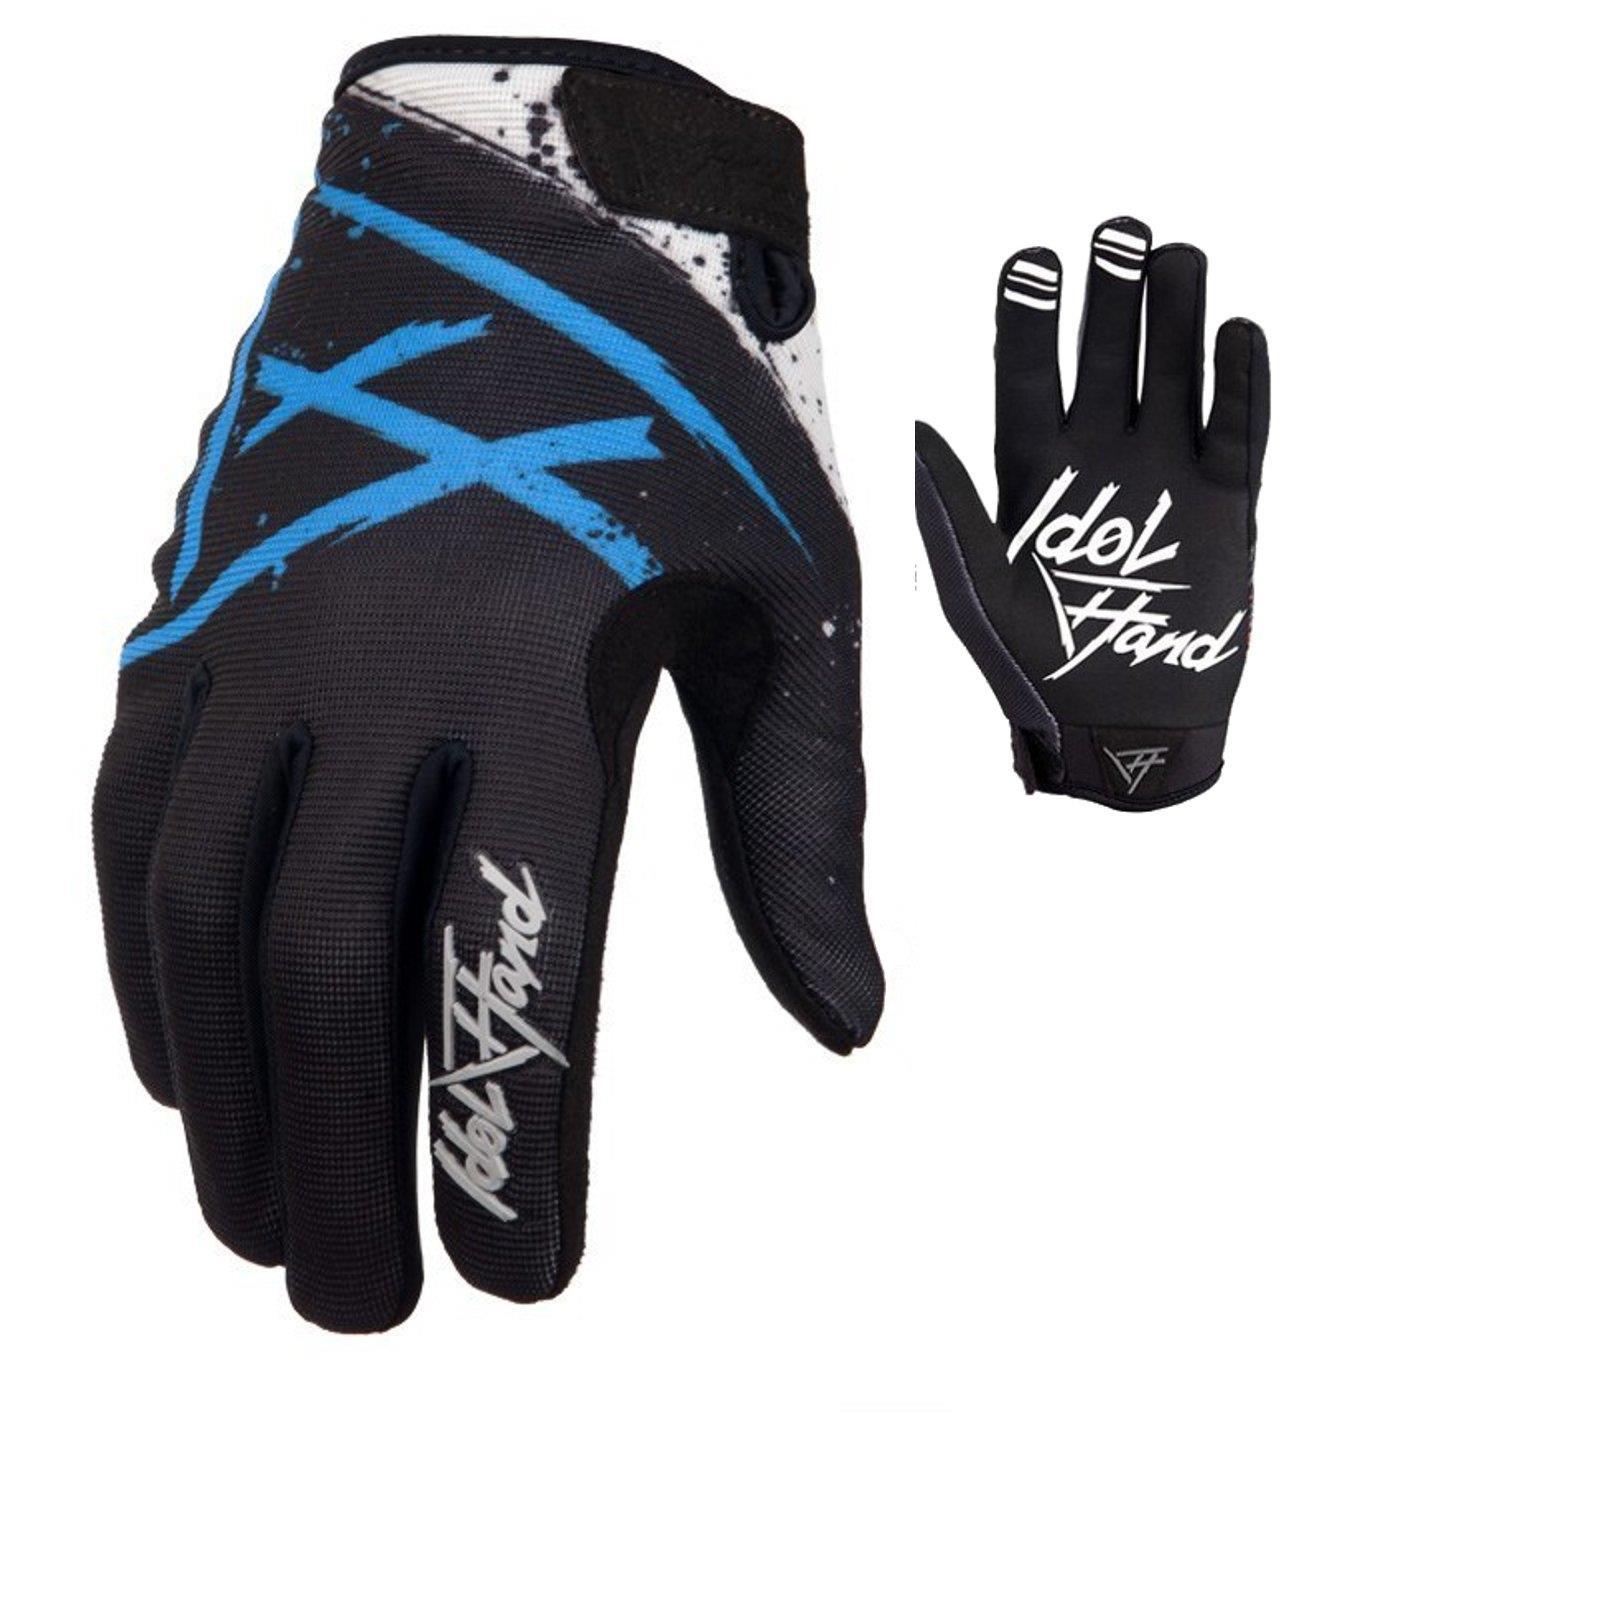 Idol Hand MX MTB Handschuhe Persuit Holeshot Weiß Motocross Enduro Offroad BMX